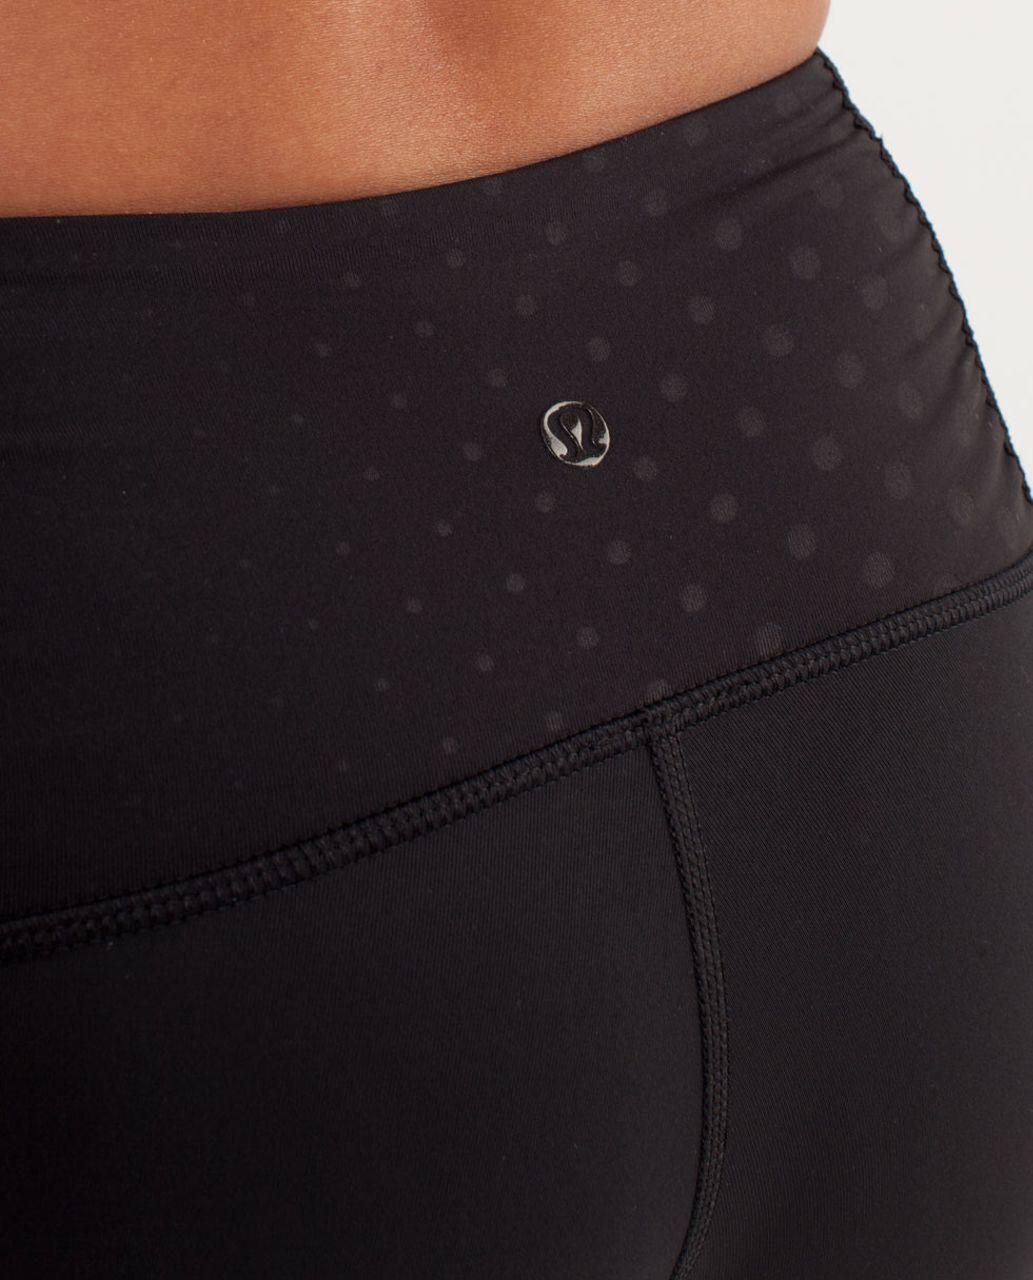 Lululemon Some Like It Hot Crop - Black / Faded Dot Embossed Black